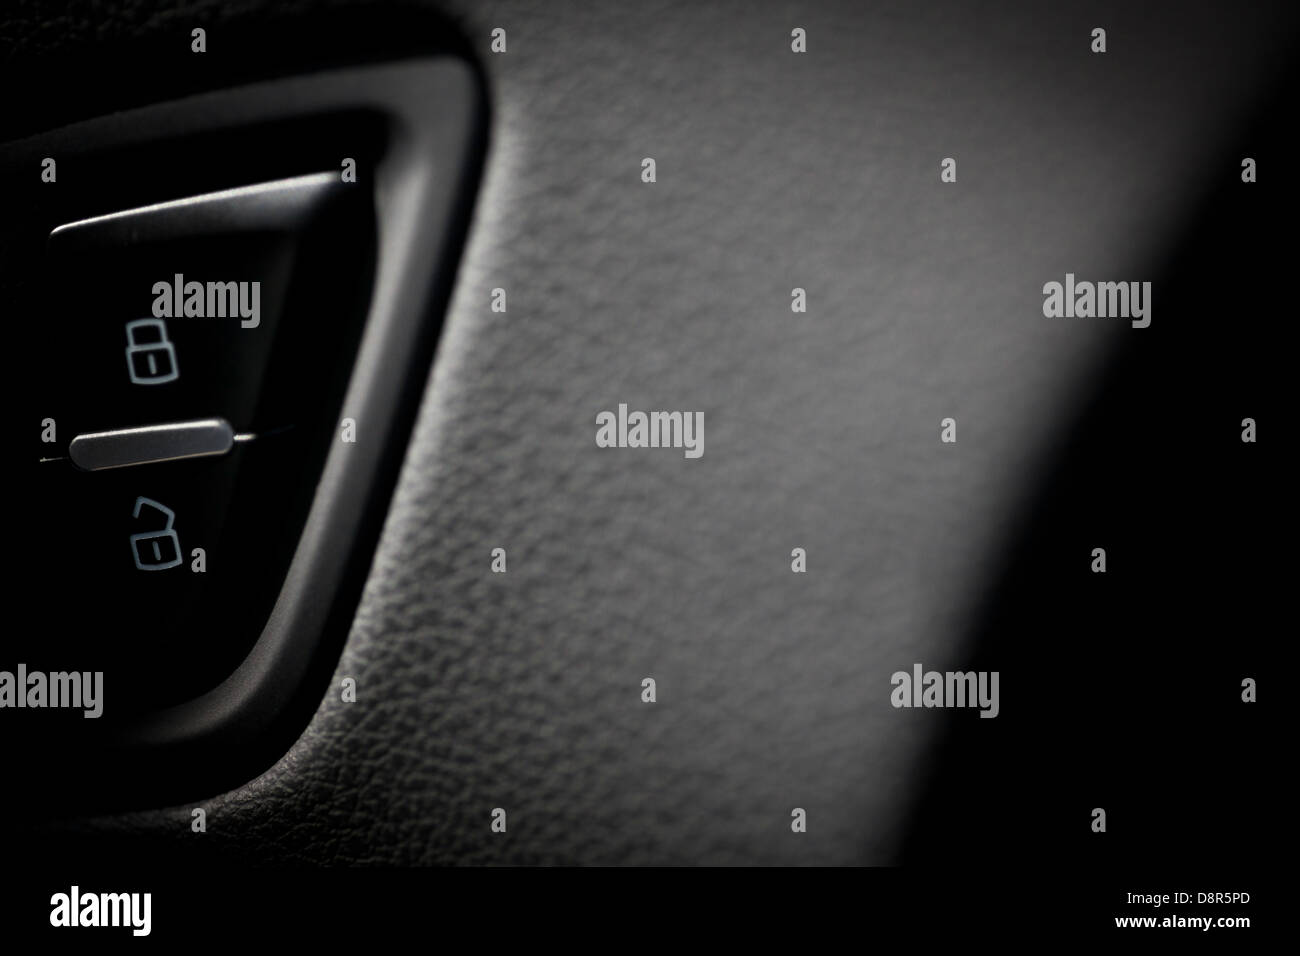 Car Door Lock Button With Detail On Button Car Door Lock Stock Photo 57057797 Alamy